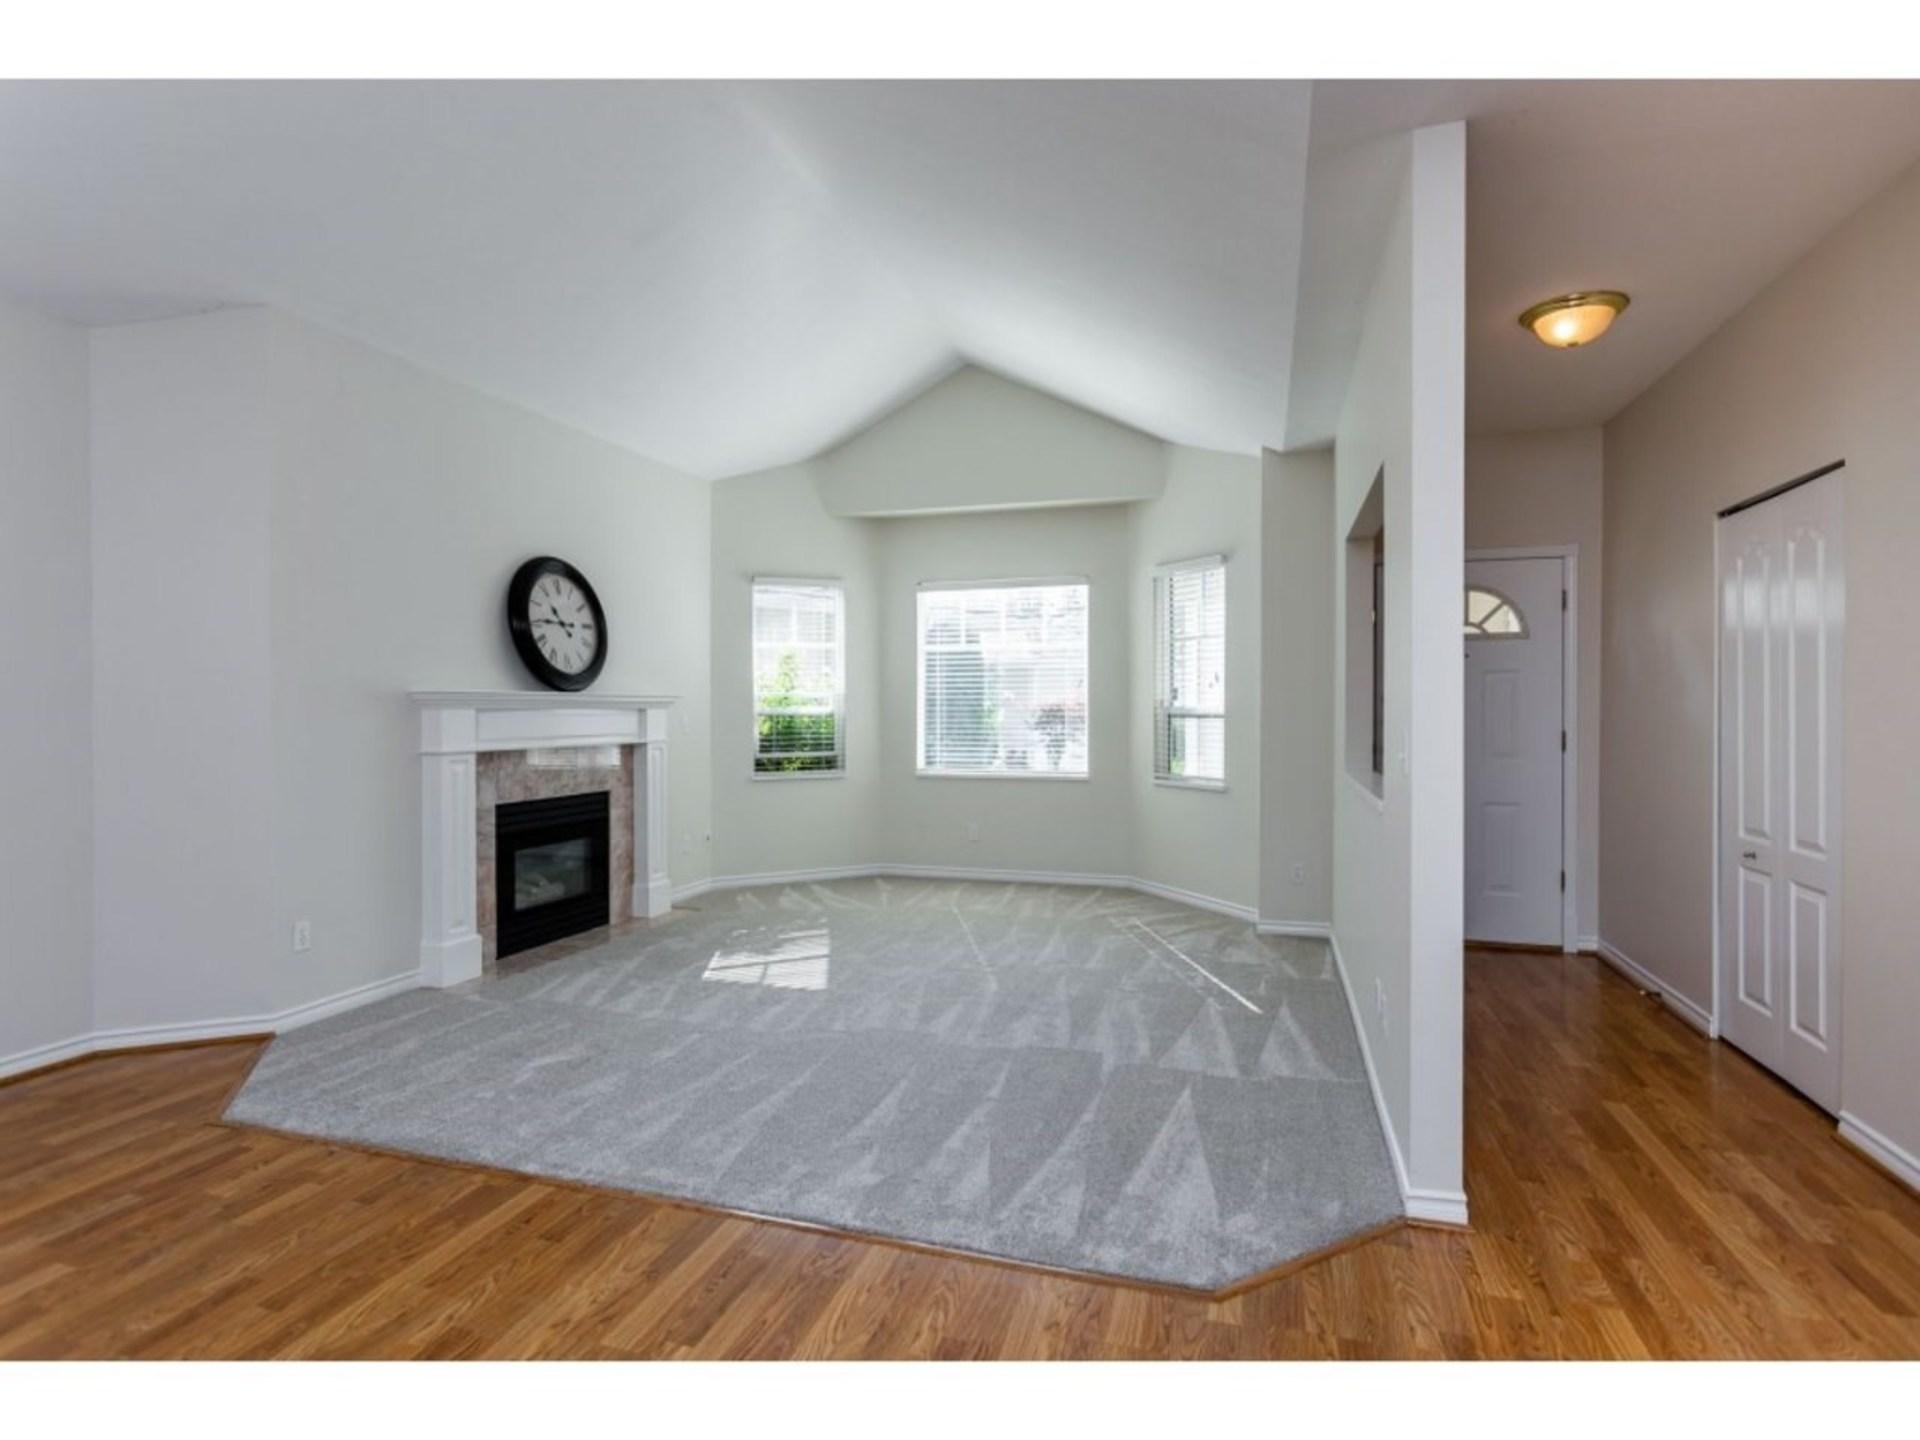 20655-88-avenue-walnut-grove-langley-03 at 330 - 20655 88 Avenue, Walnut Grove, Langley